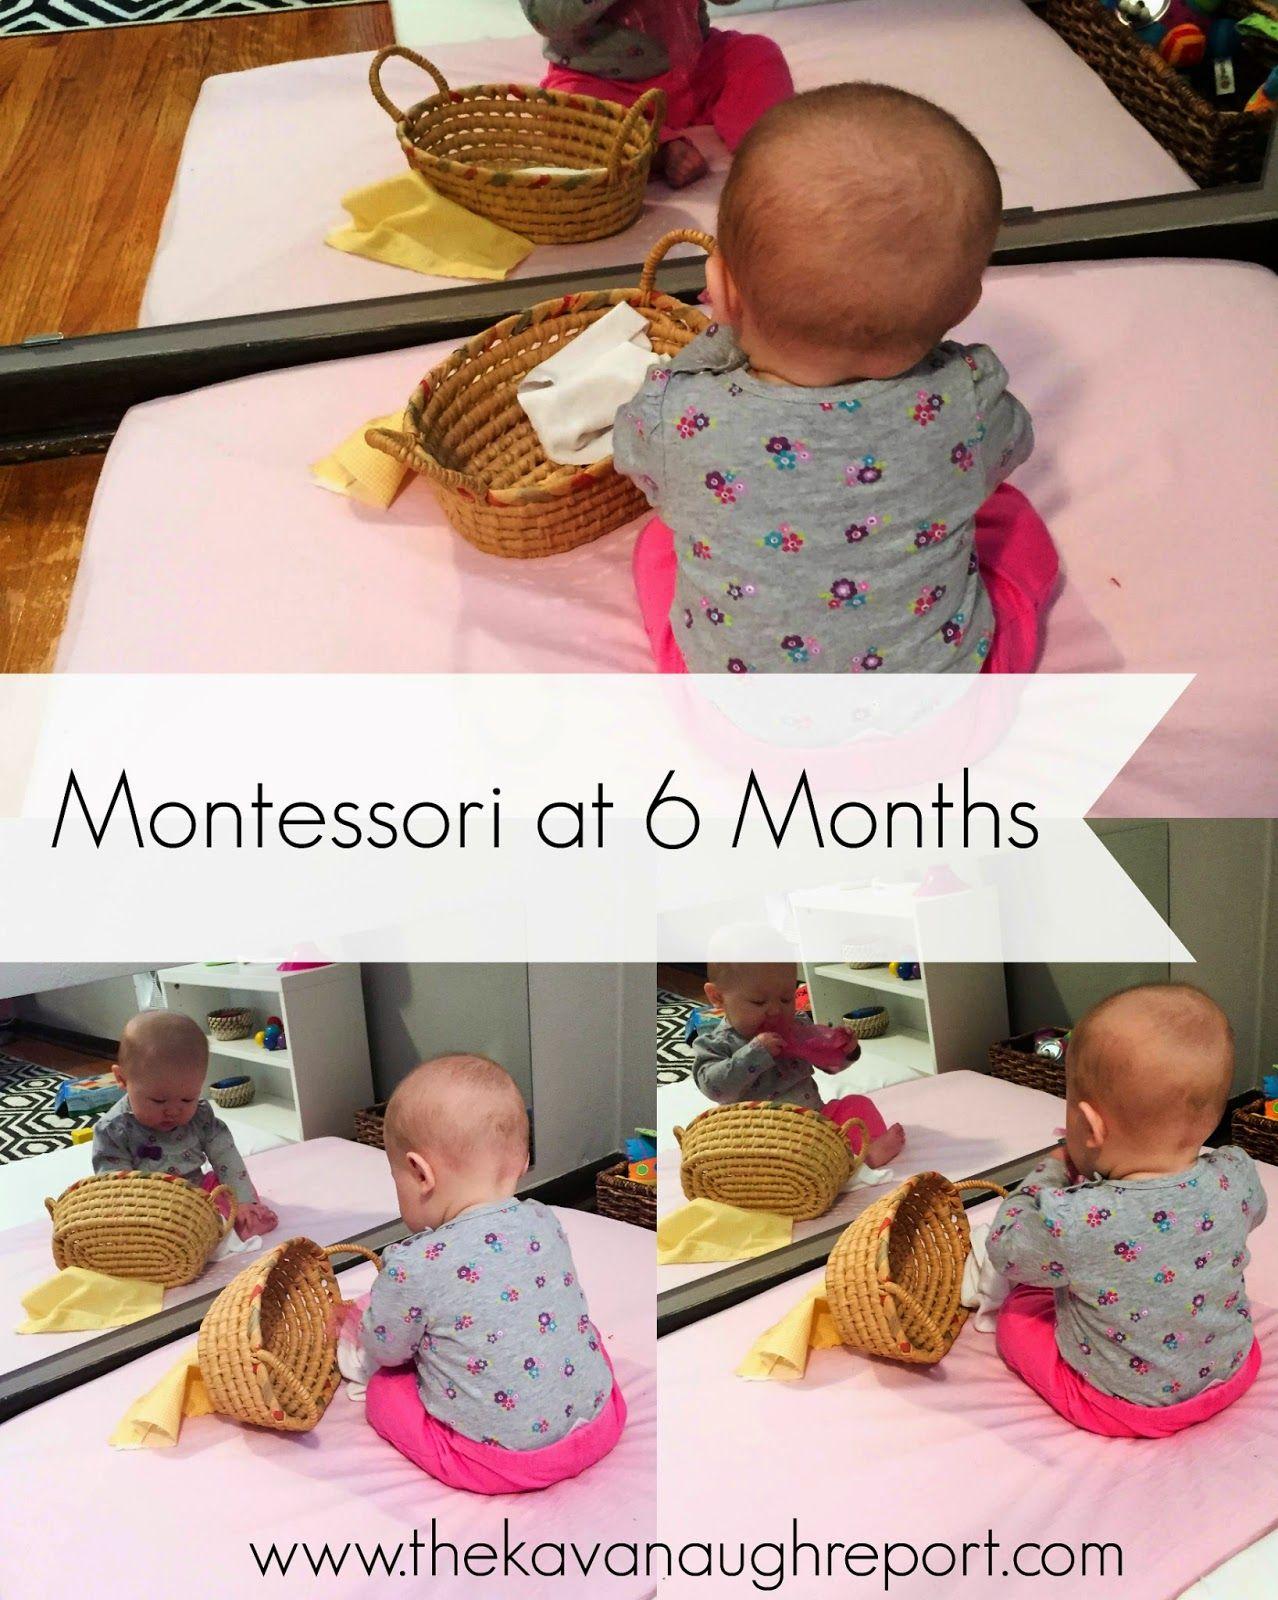 montessori work shelves at 6 months abigail pinterest. Black Bedroom Furniture Sets. Home Design Ideas